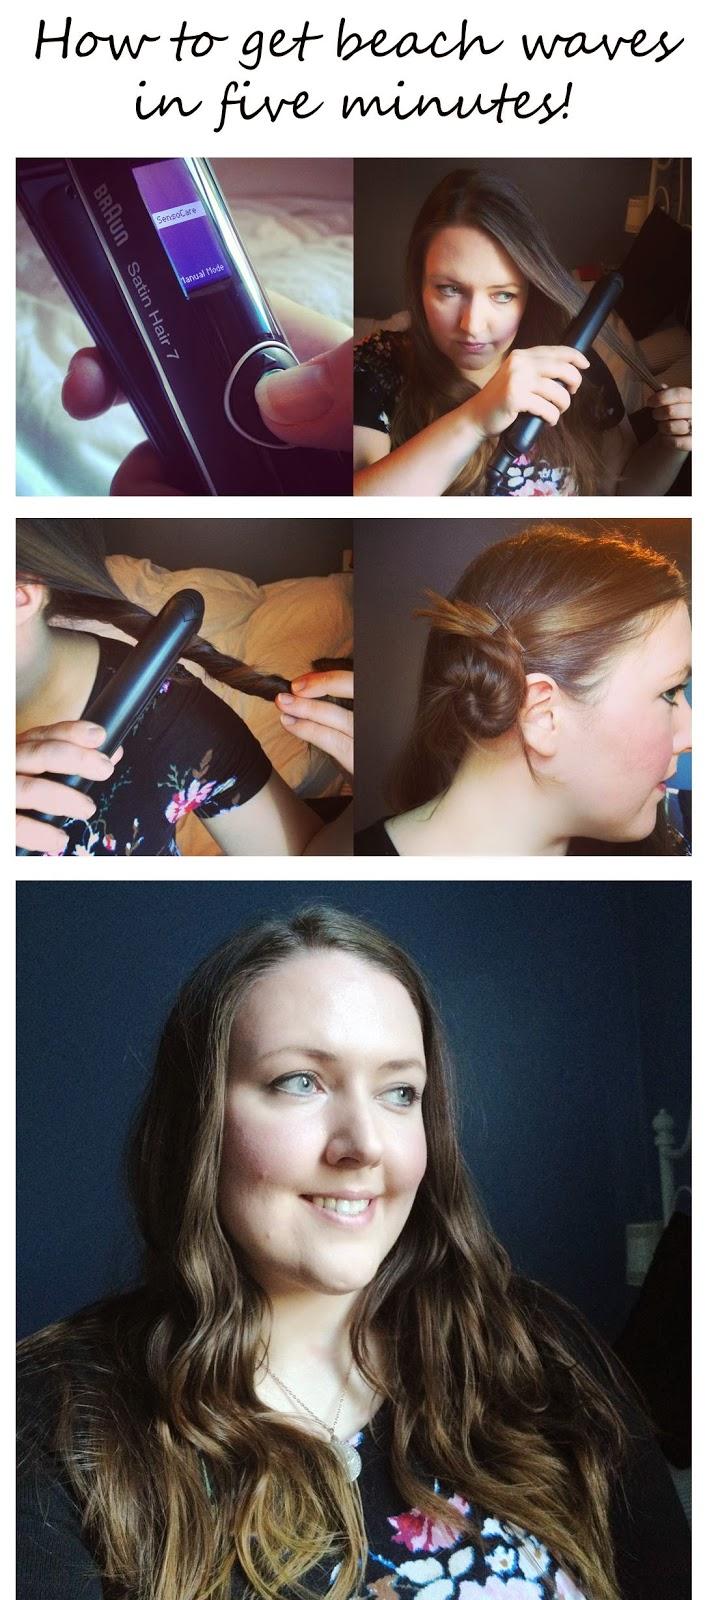 http://www.johnlewis.com/braun-st780-satin-hair-7-sensocare-hair-styler/p927222